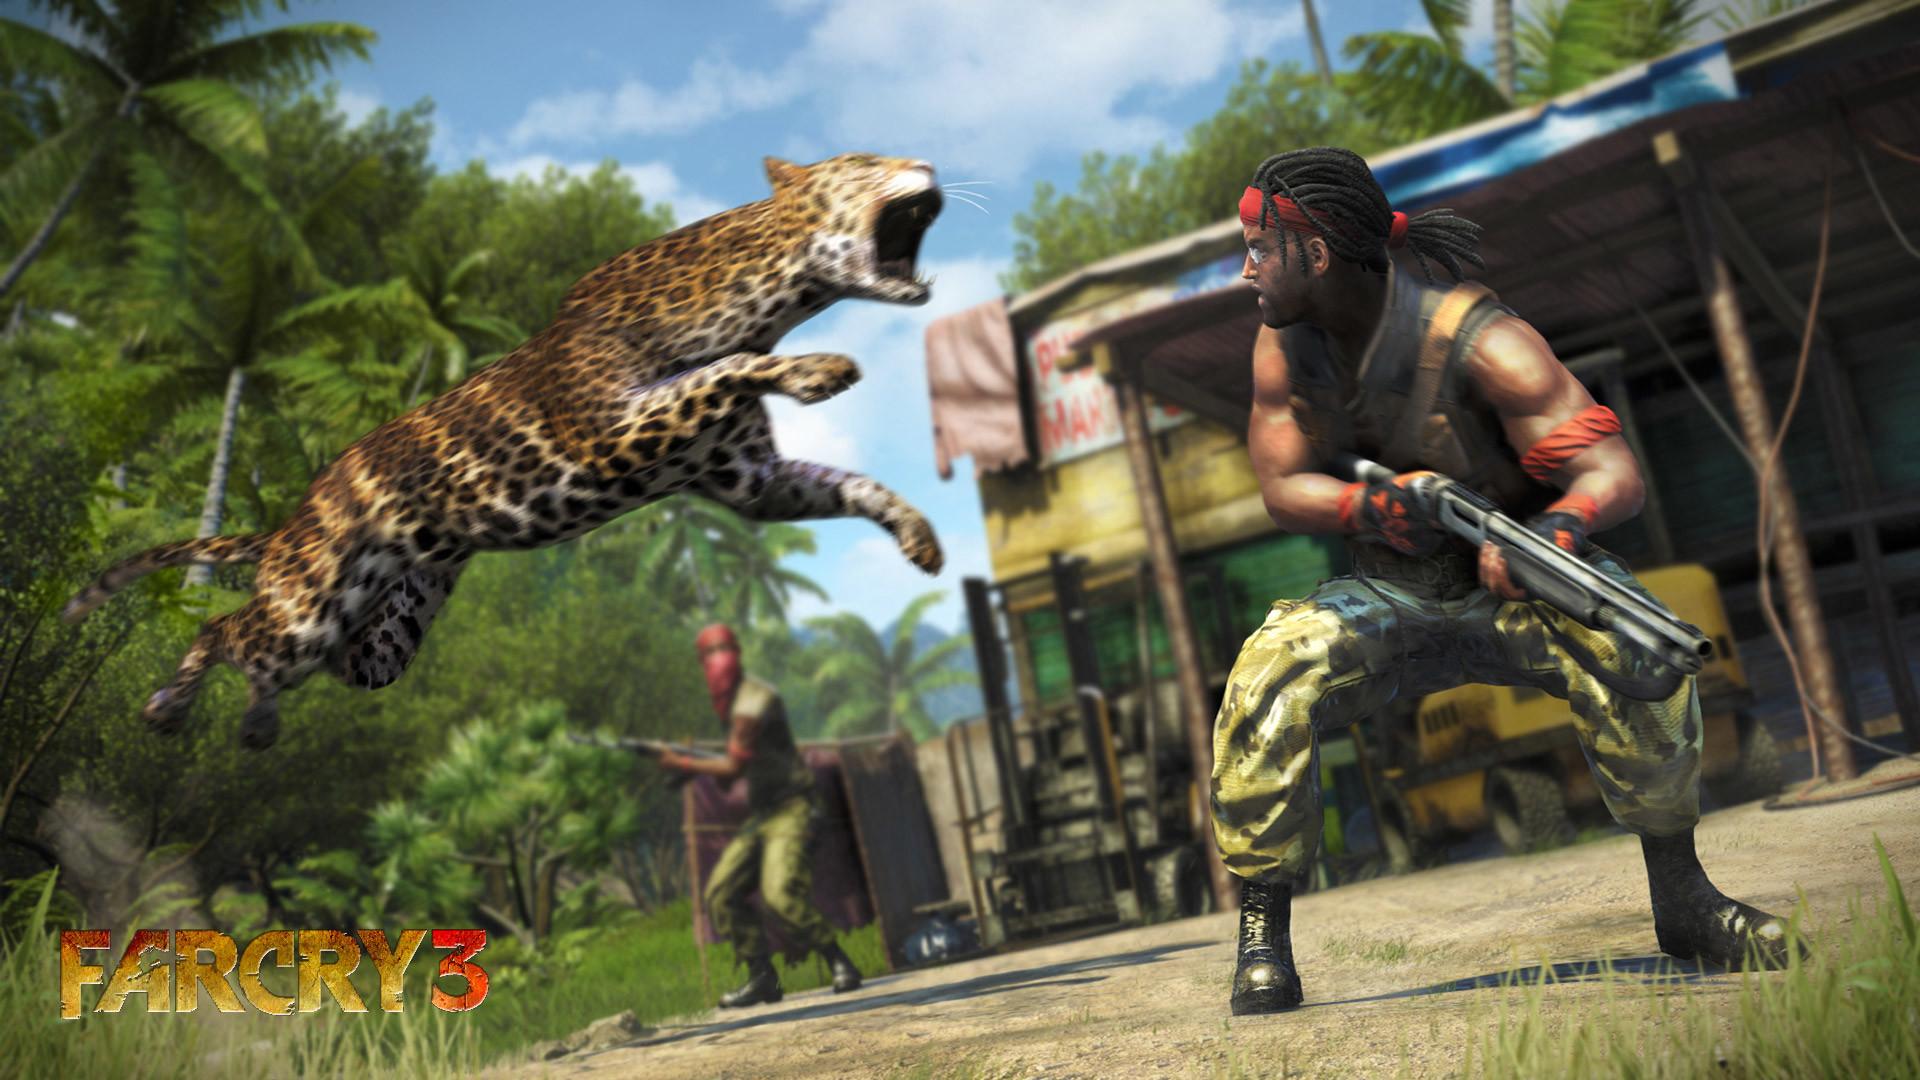 Far Cry 3 Tiger Attack Wallpaper HD Desktop Wallpaper, Background Image